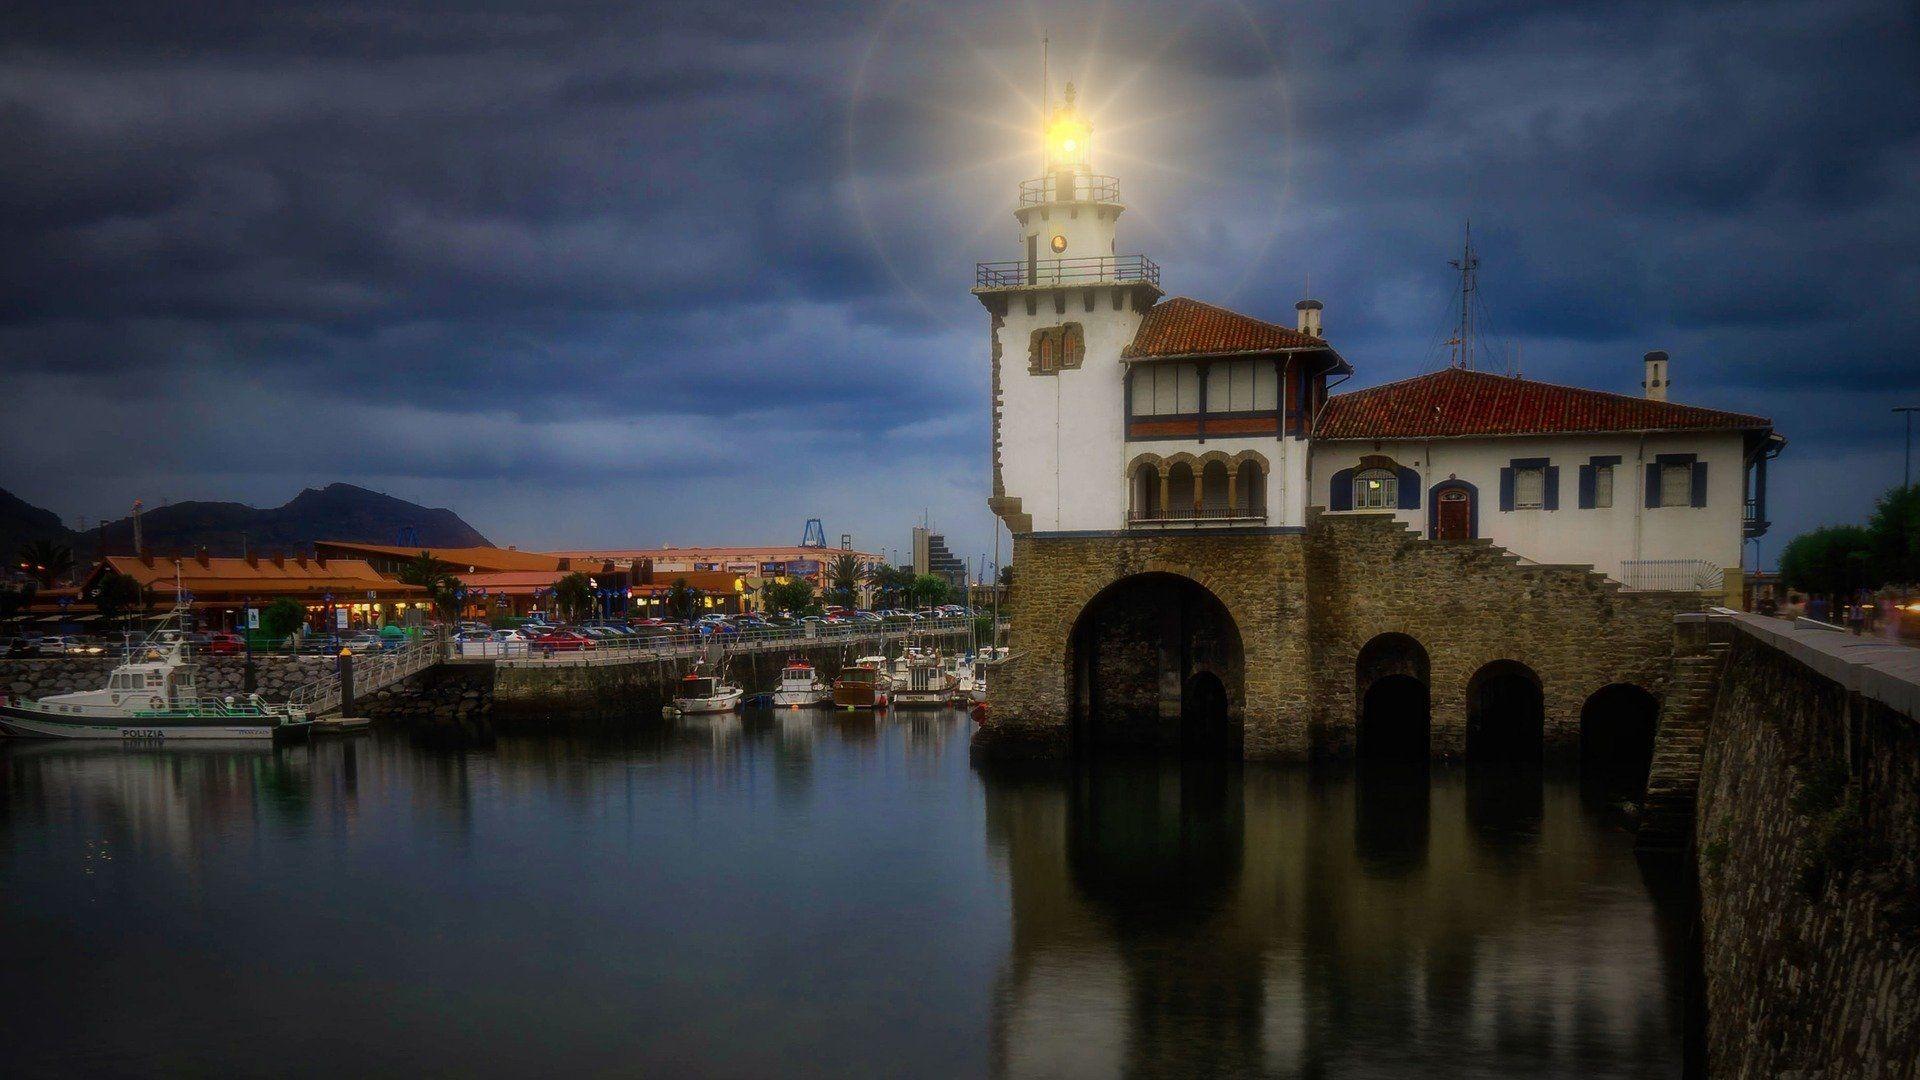 lighthouse-3808275_1920